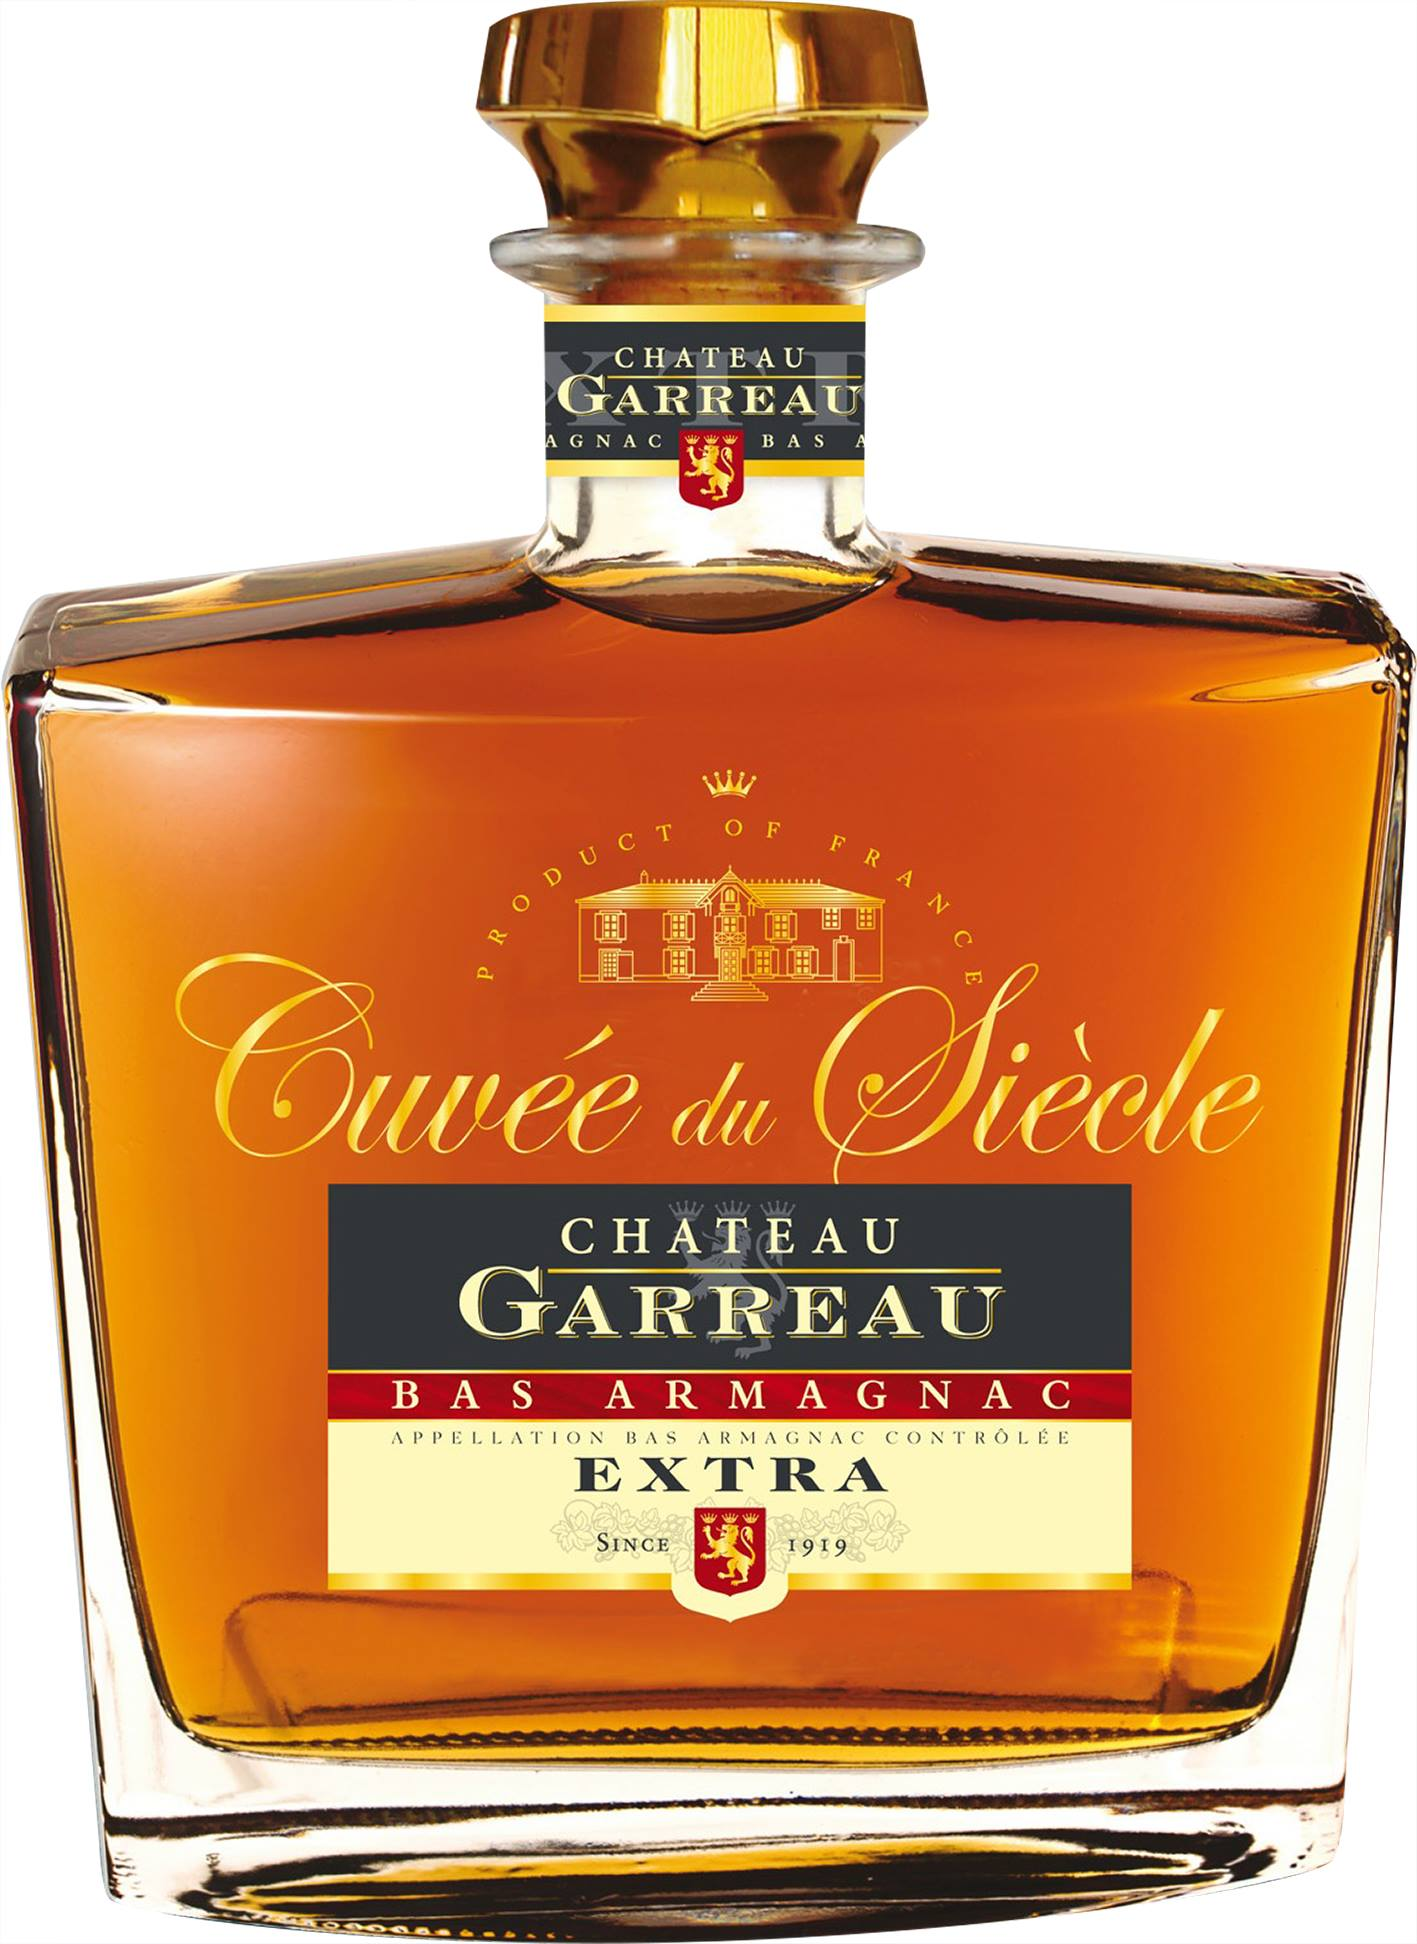 Château Garreau – Cuvée du Siècle, Extra – Bas-Armagnac